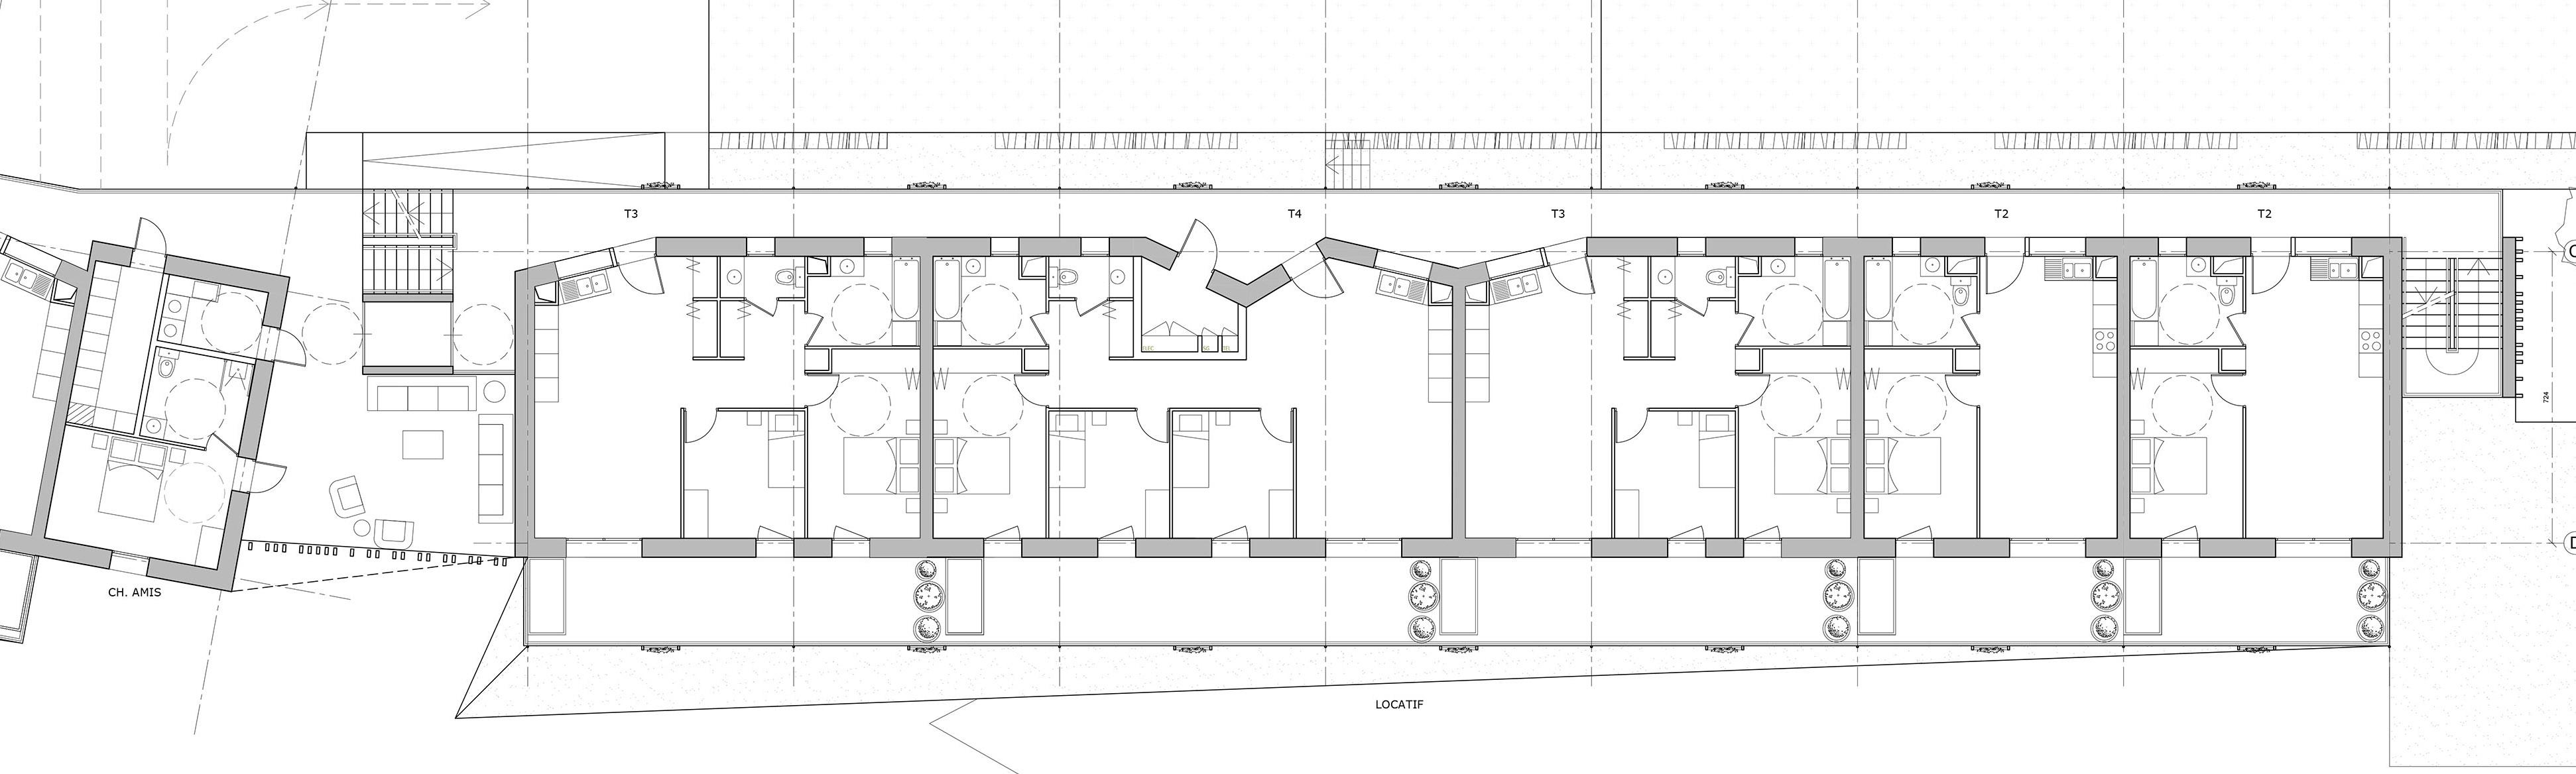 image plan_logements_dtail.jpg (0.4MB)